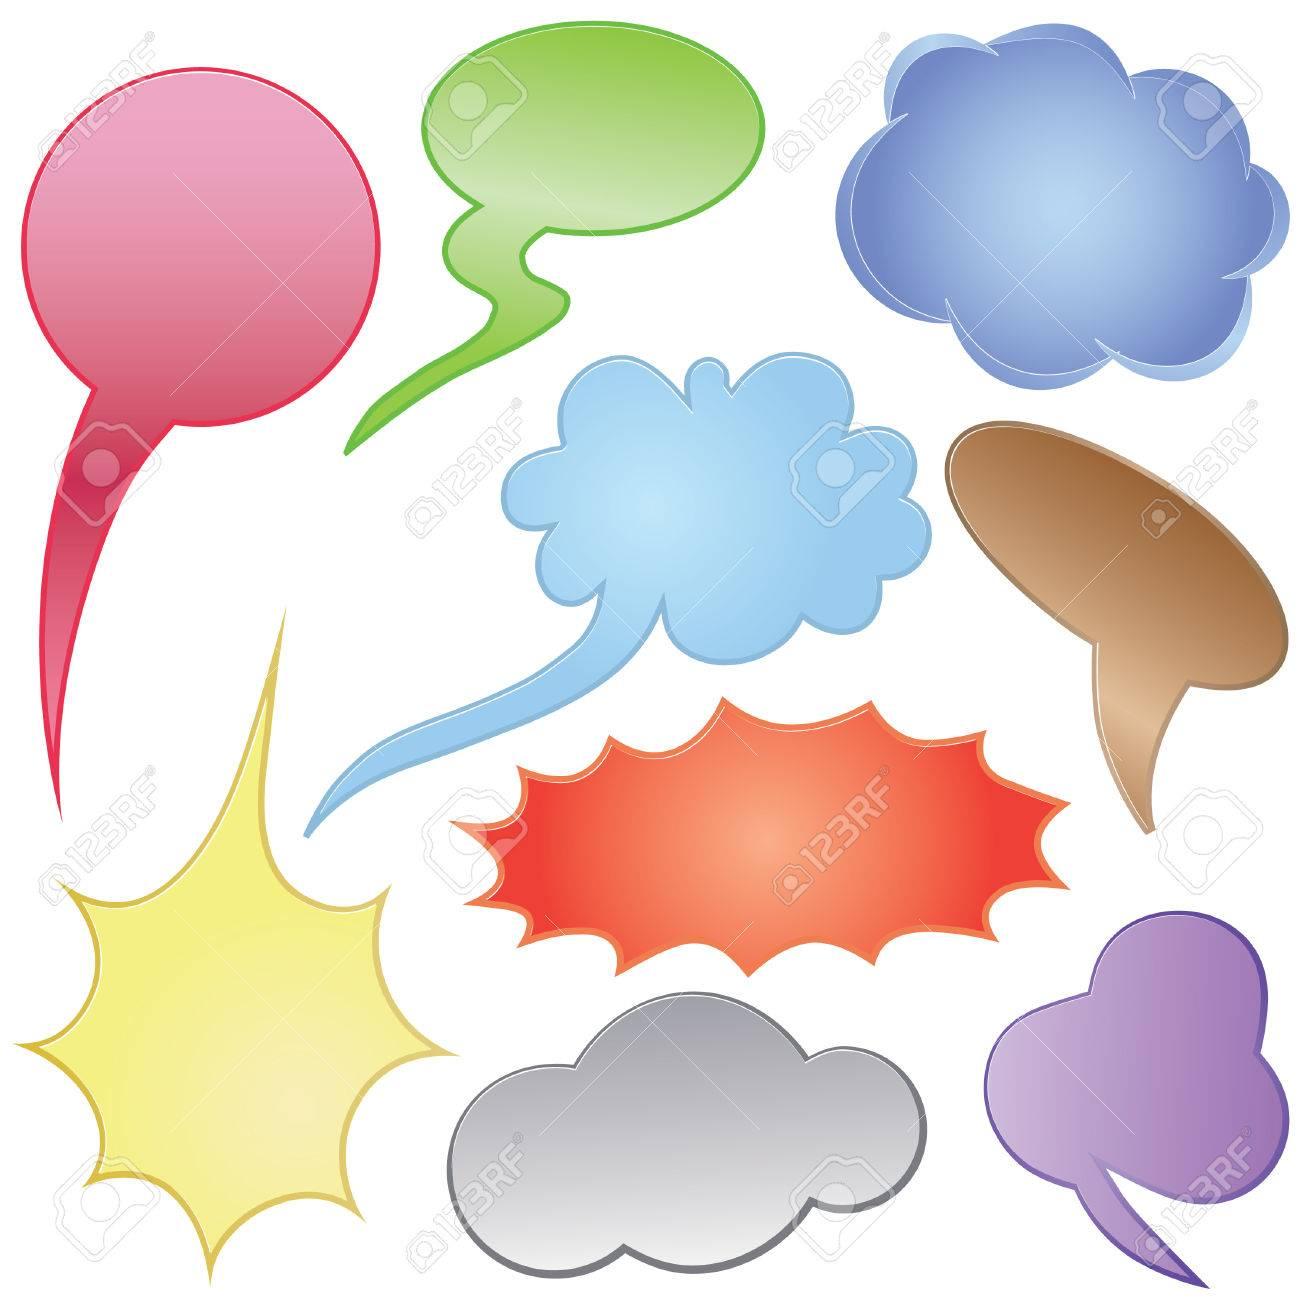 Dialog clouds. Vector illustration. Elements for design. Stock Vector - 7851734